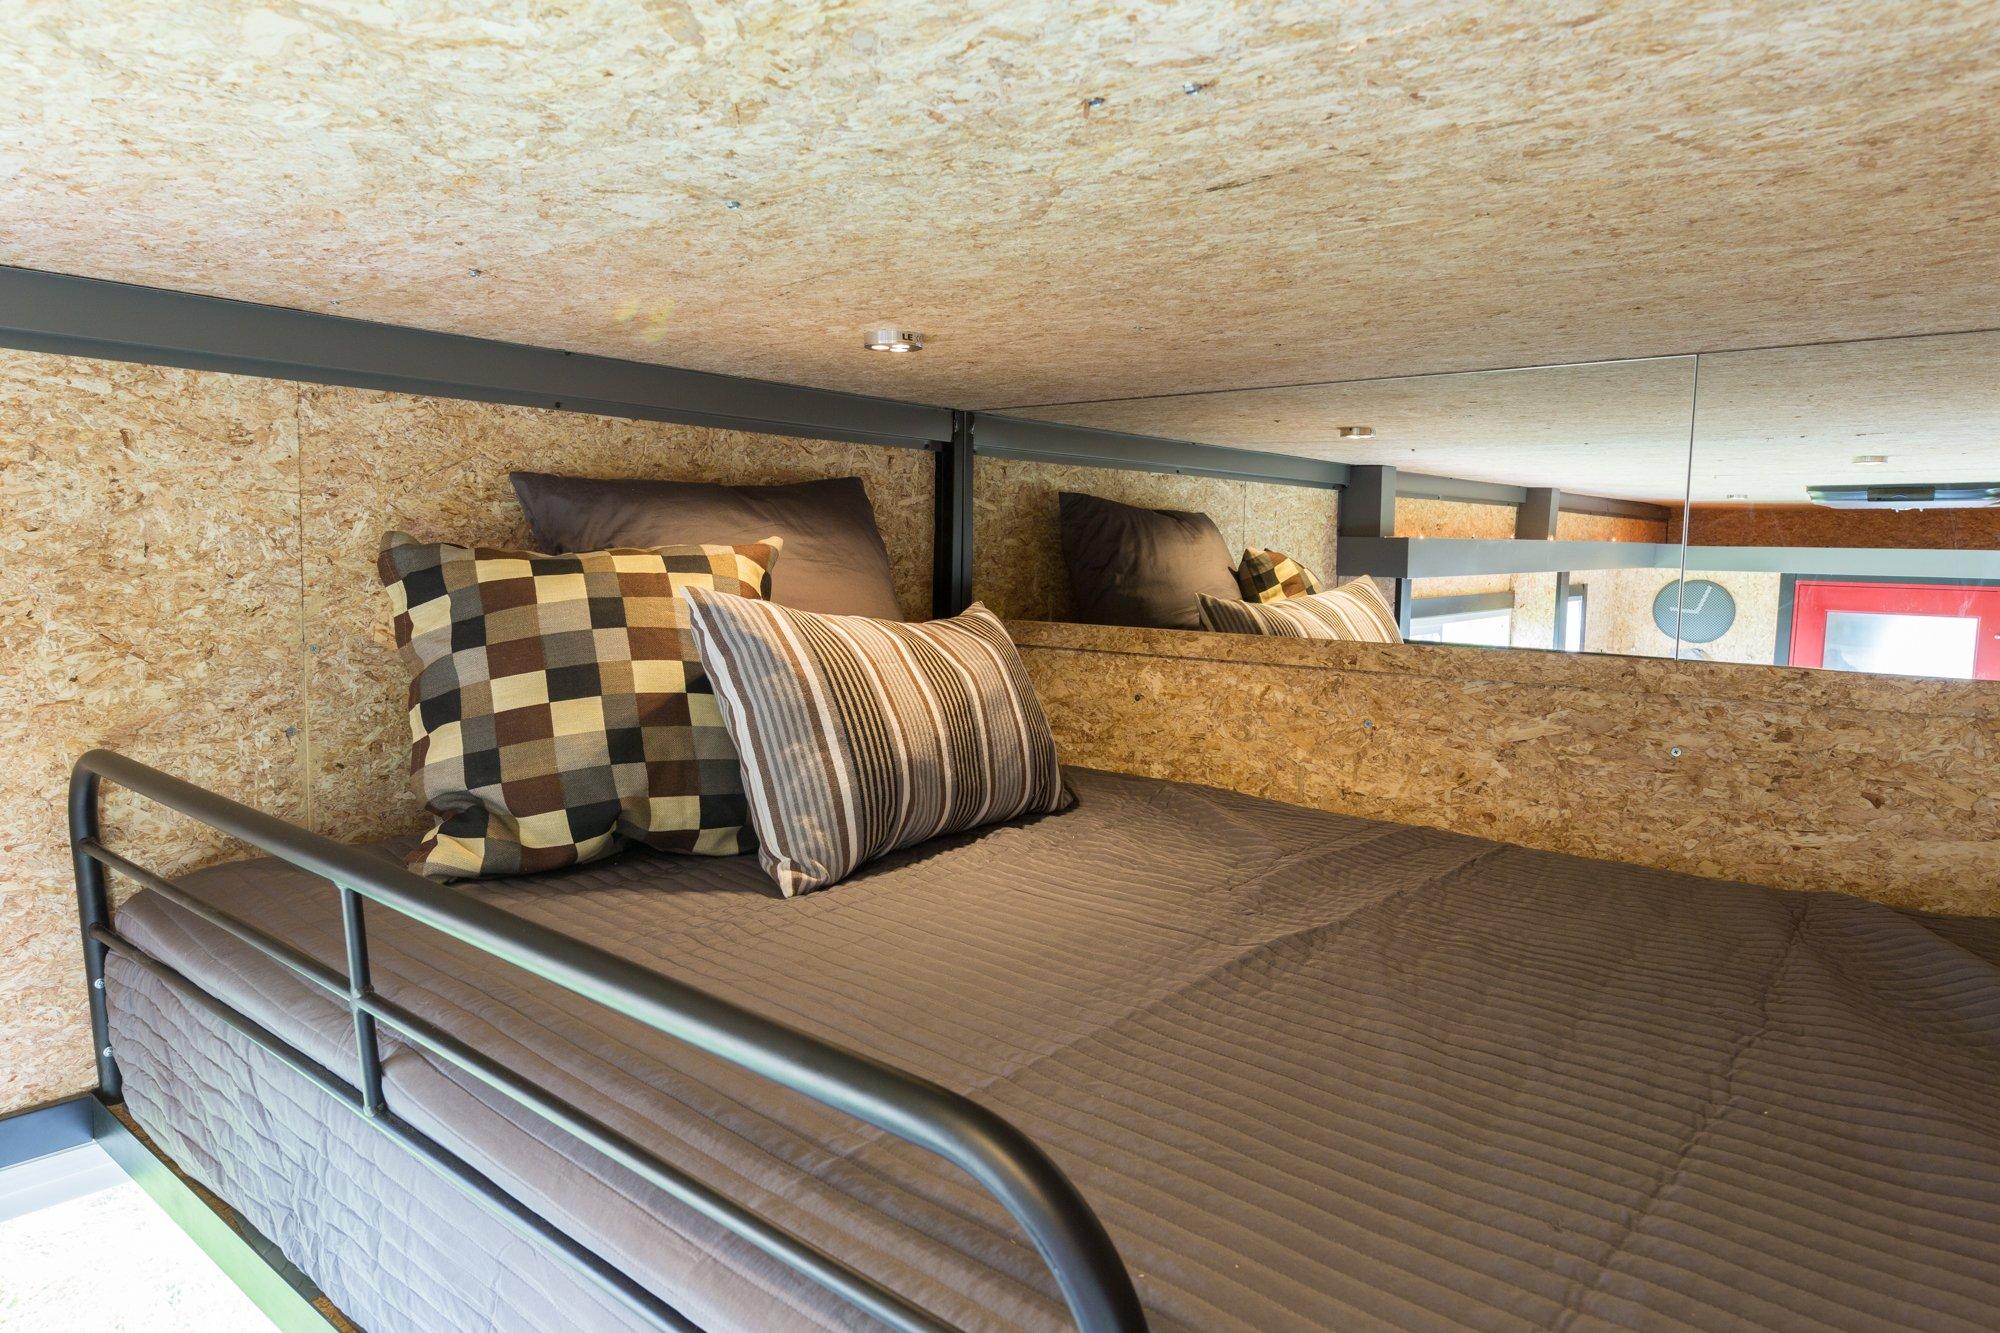 Upper bunk